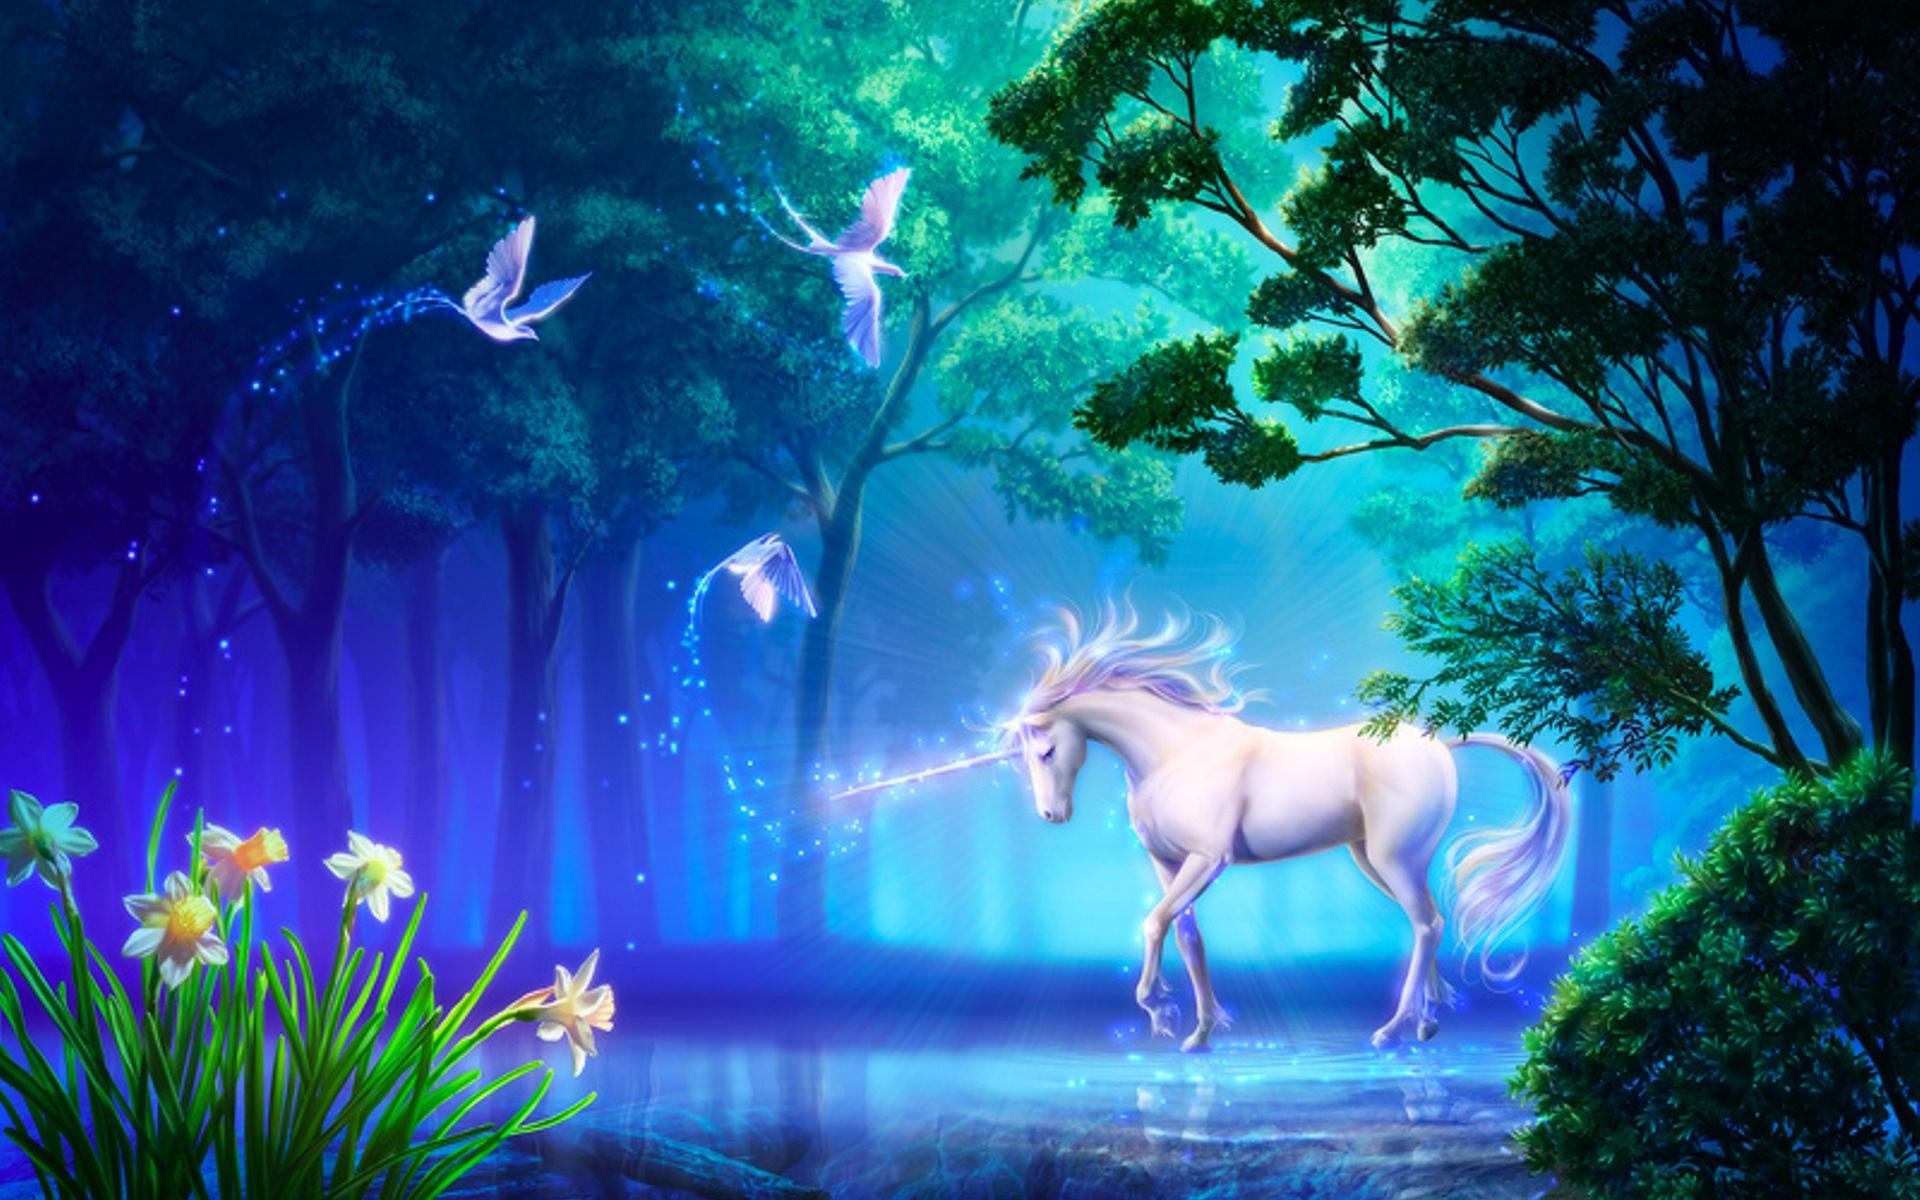 Fantasy unicorn horse tree magic art flower wallpaper background